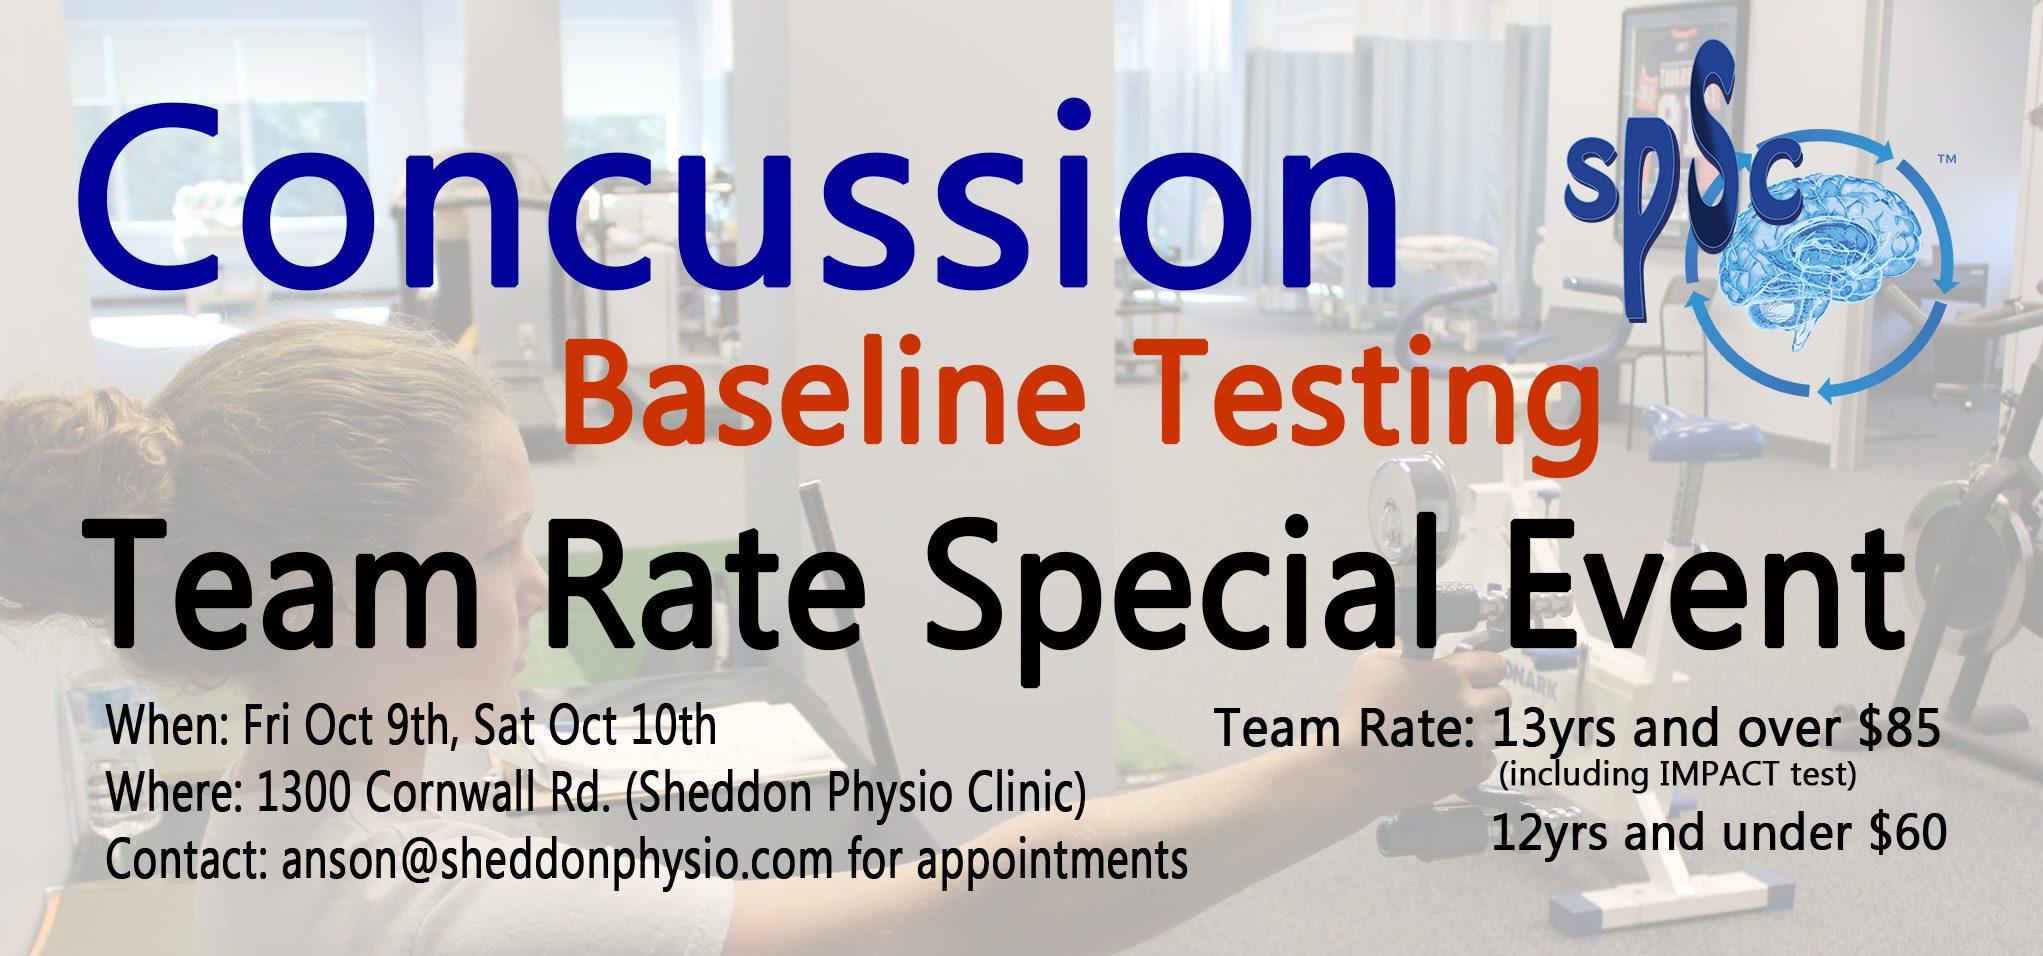 Concussion Baseline Testing 2015 Sheddon Physio Sports Clinic Oakville Mississauga